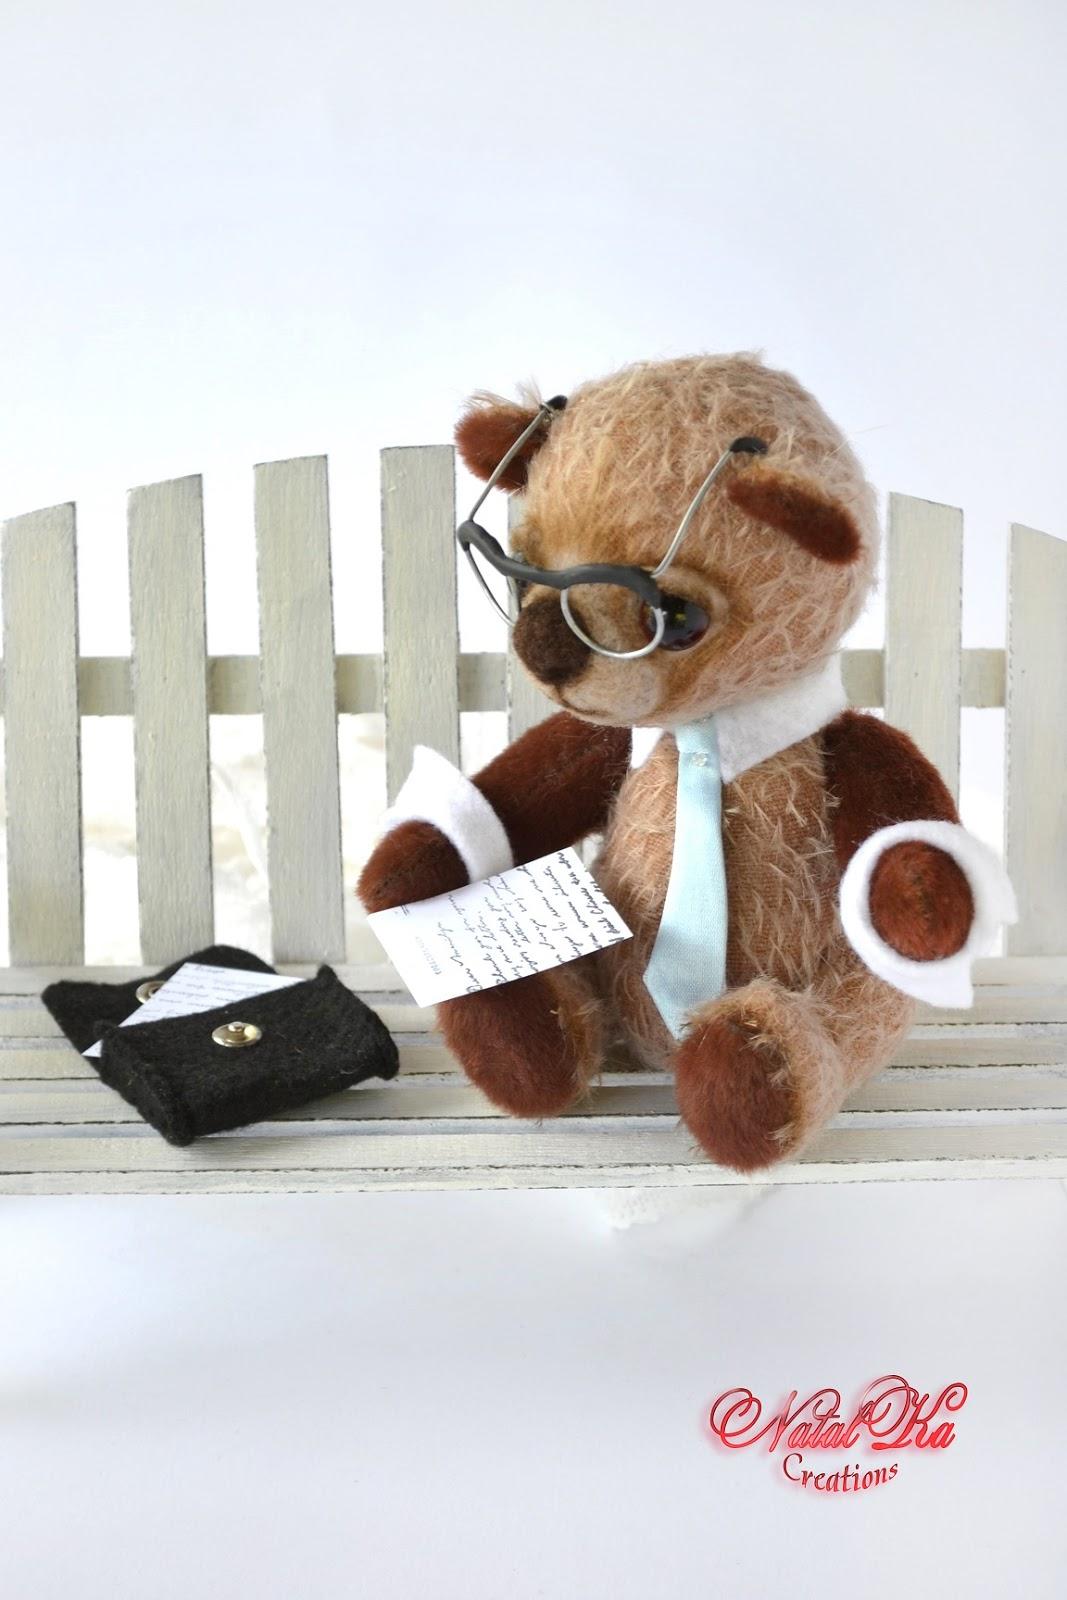 Künstler Teddybär handgemacht von NatalKa Creations. Artist teddy bear handmade by NatalKa Creations.